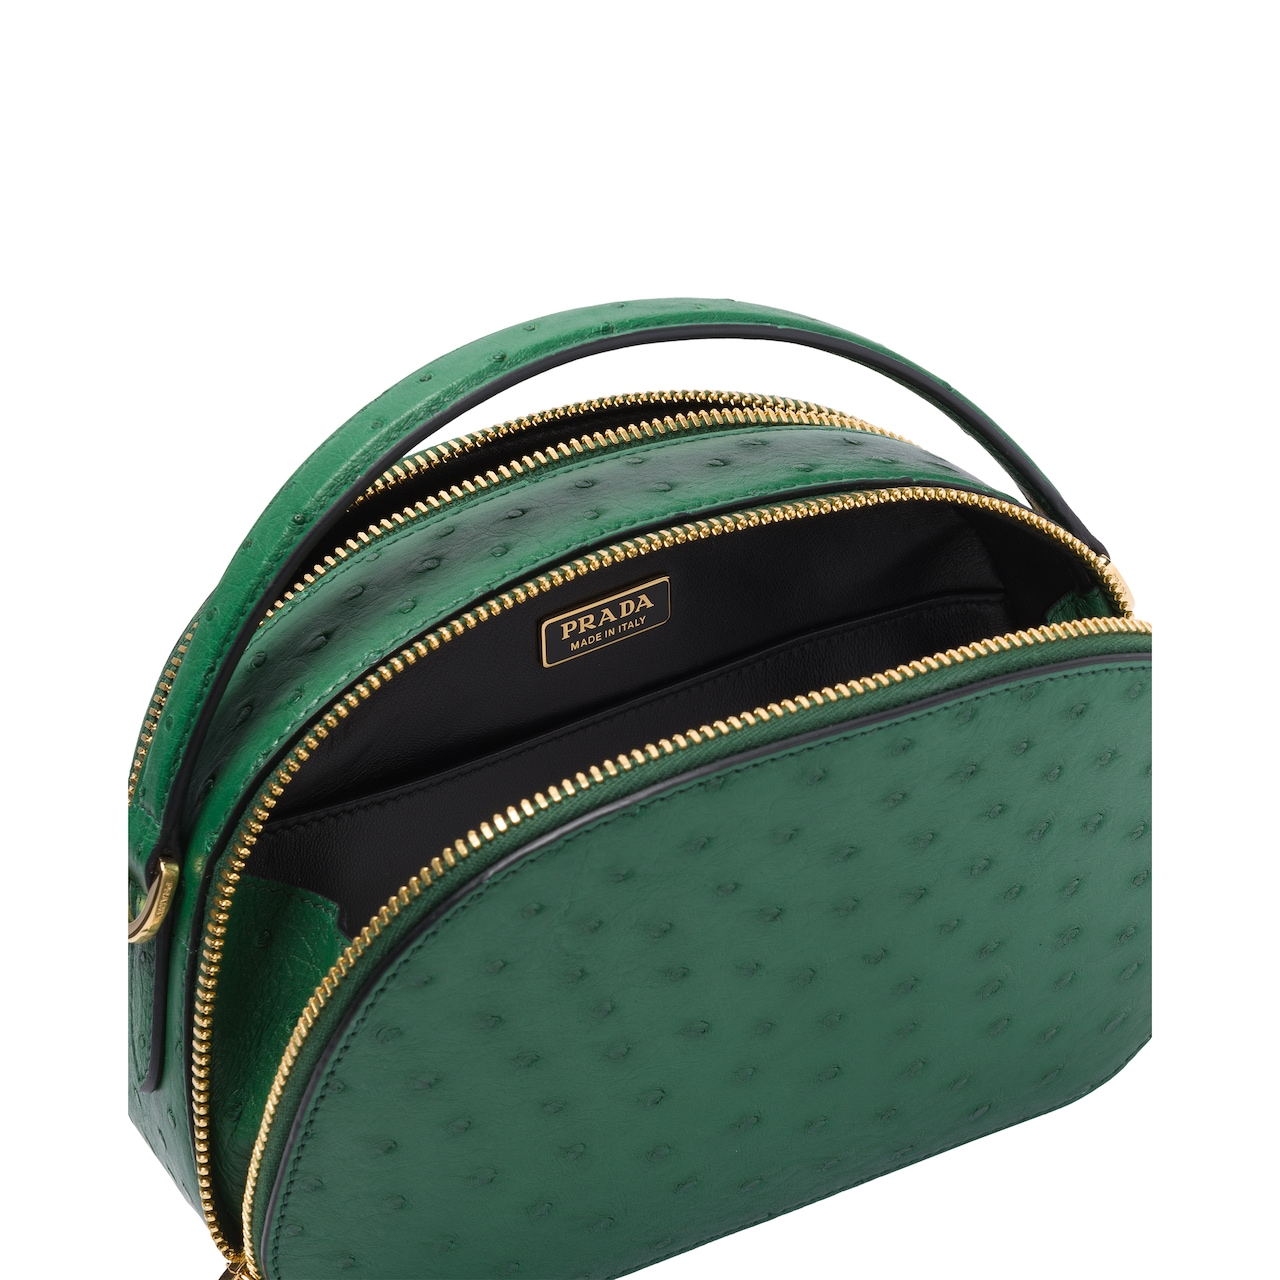 Prada Odette ostrich leather bag